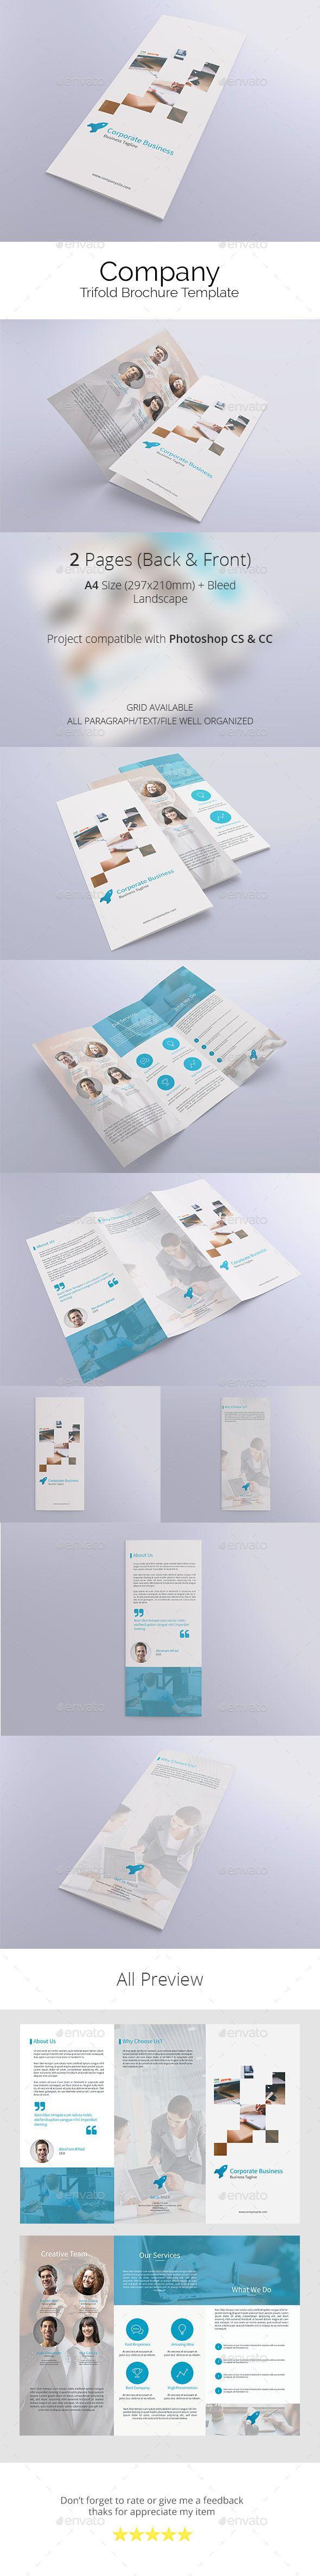 Company Trifold Brochure